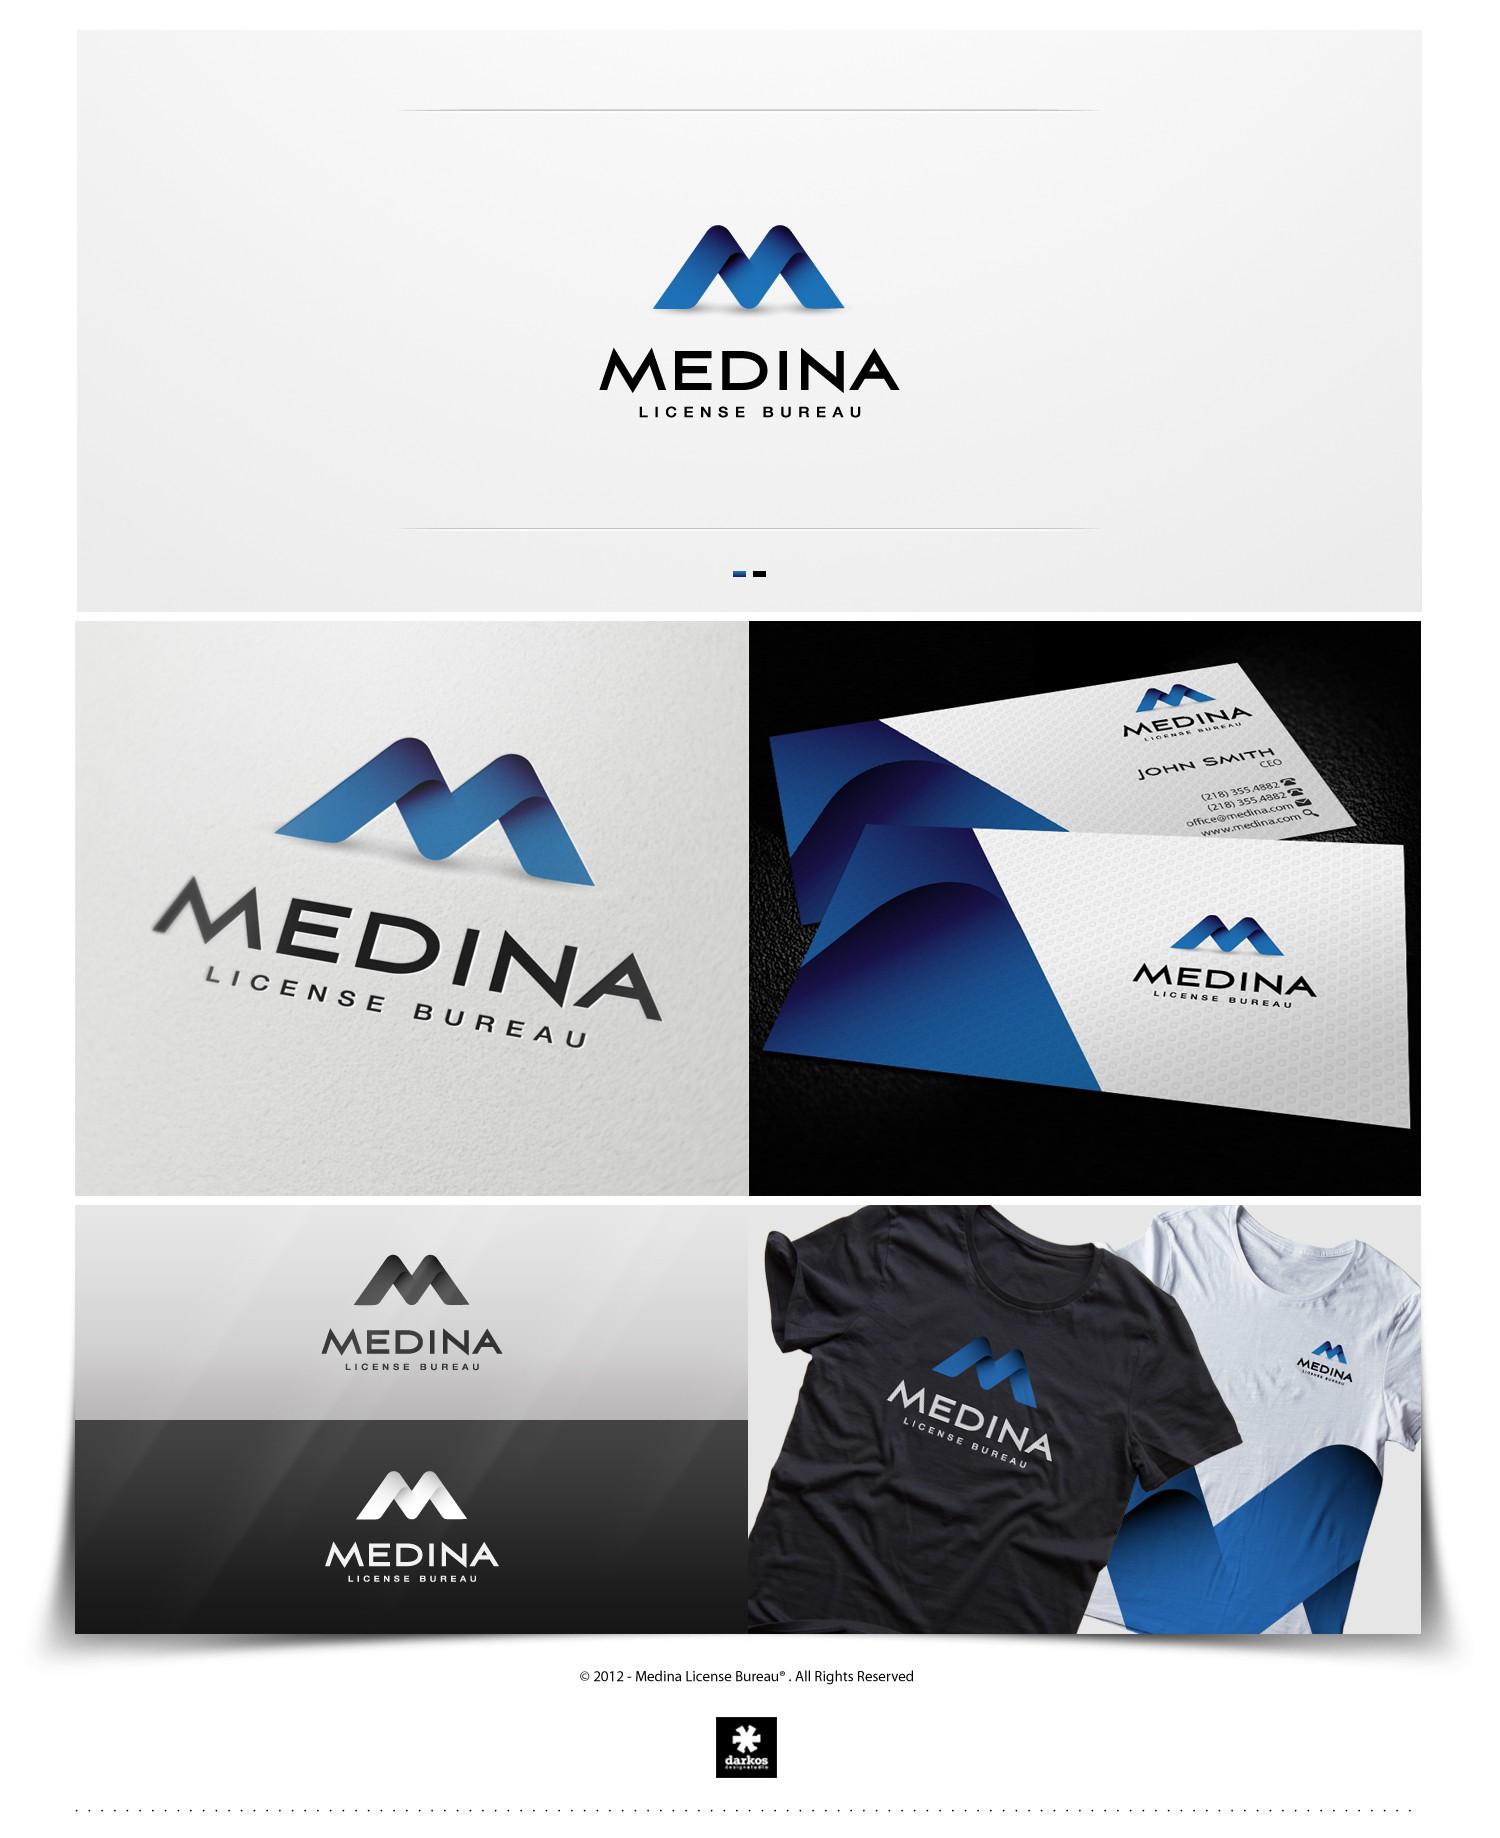 Help Medina License Bureau Inc. with a new logo